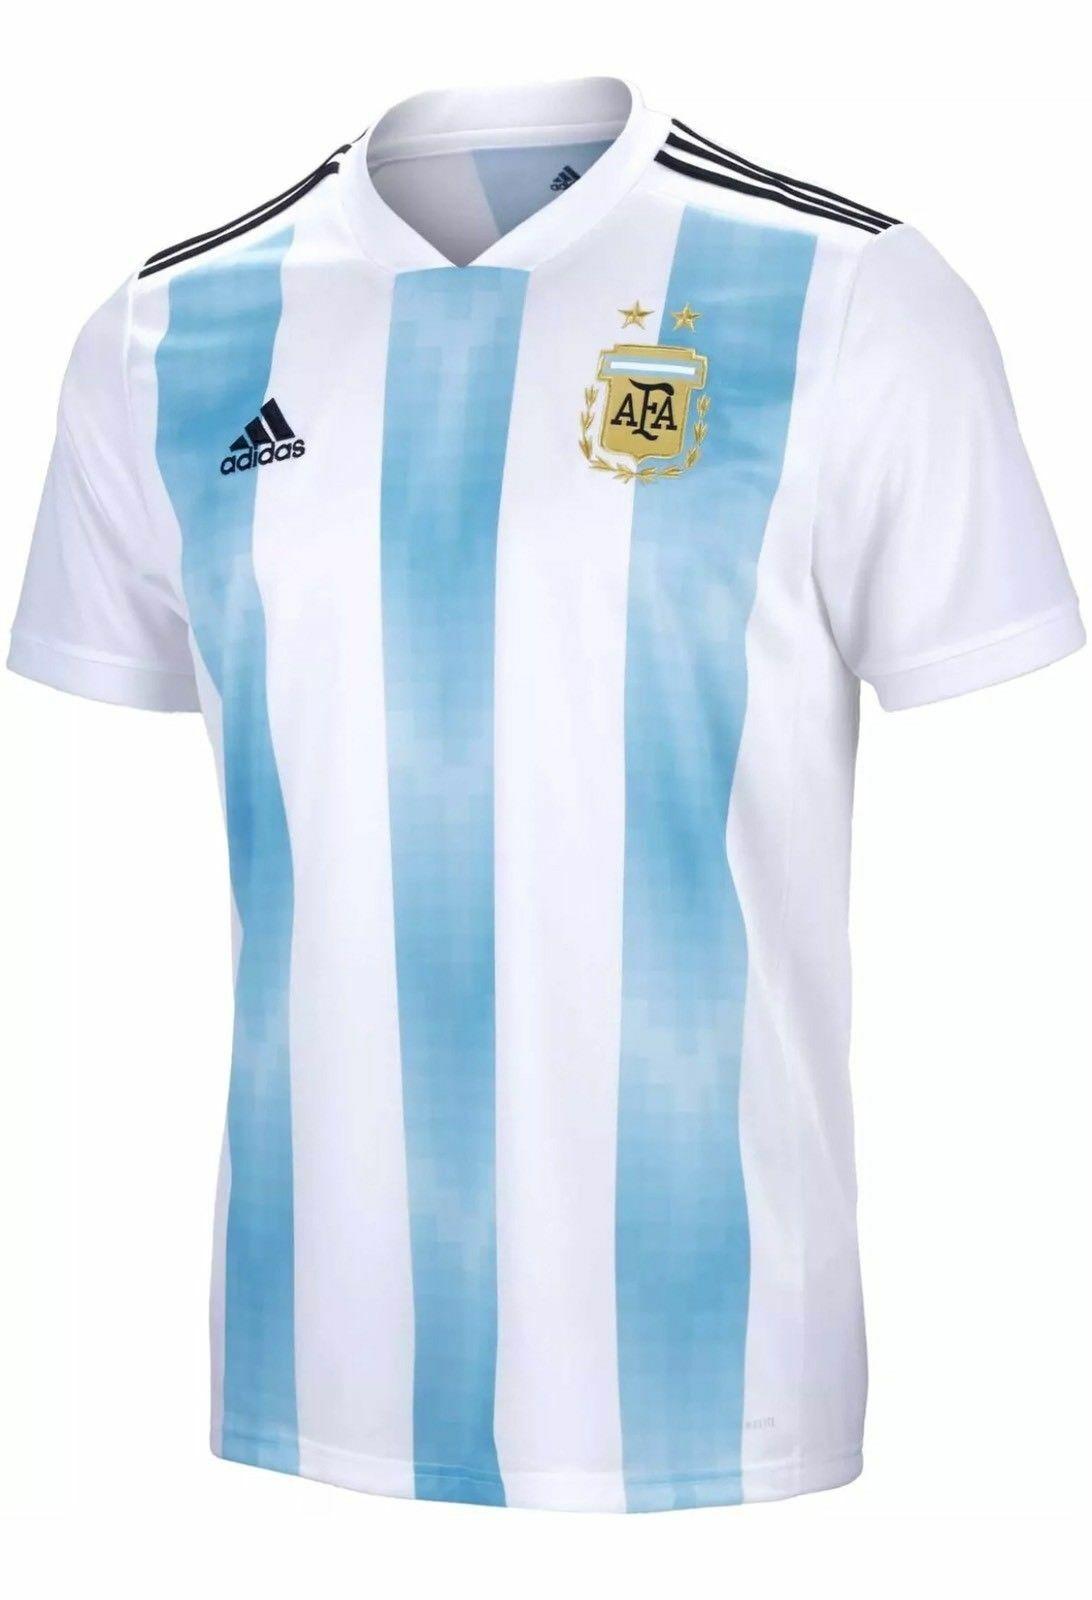 2018 World Cup argentoina National Soccer squadra Jersey Mens Adidas BQ9324